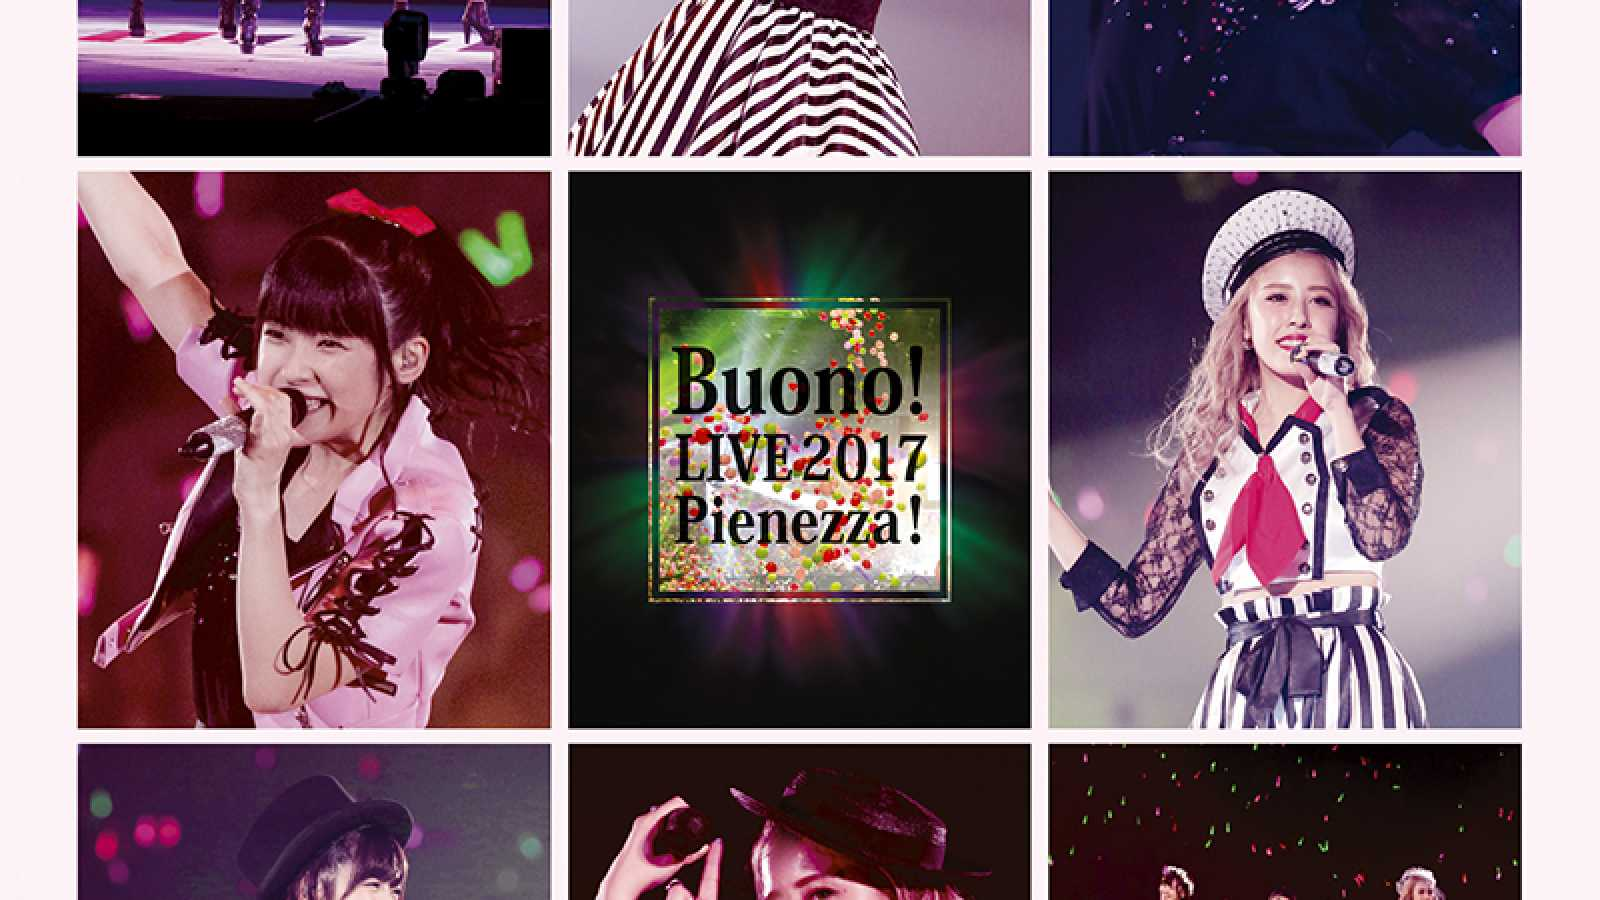 Buono! to Stream Last Live on YouTube © Buono!. All rights reserved.